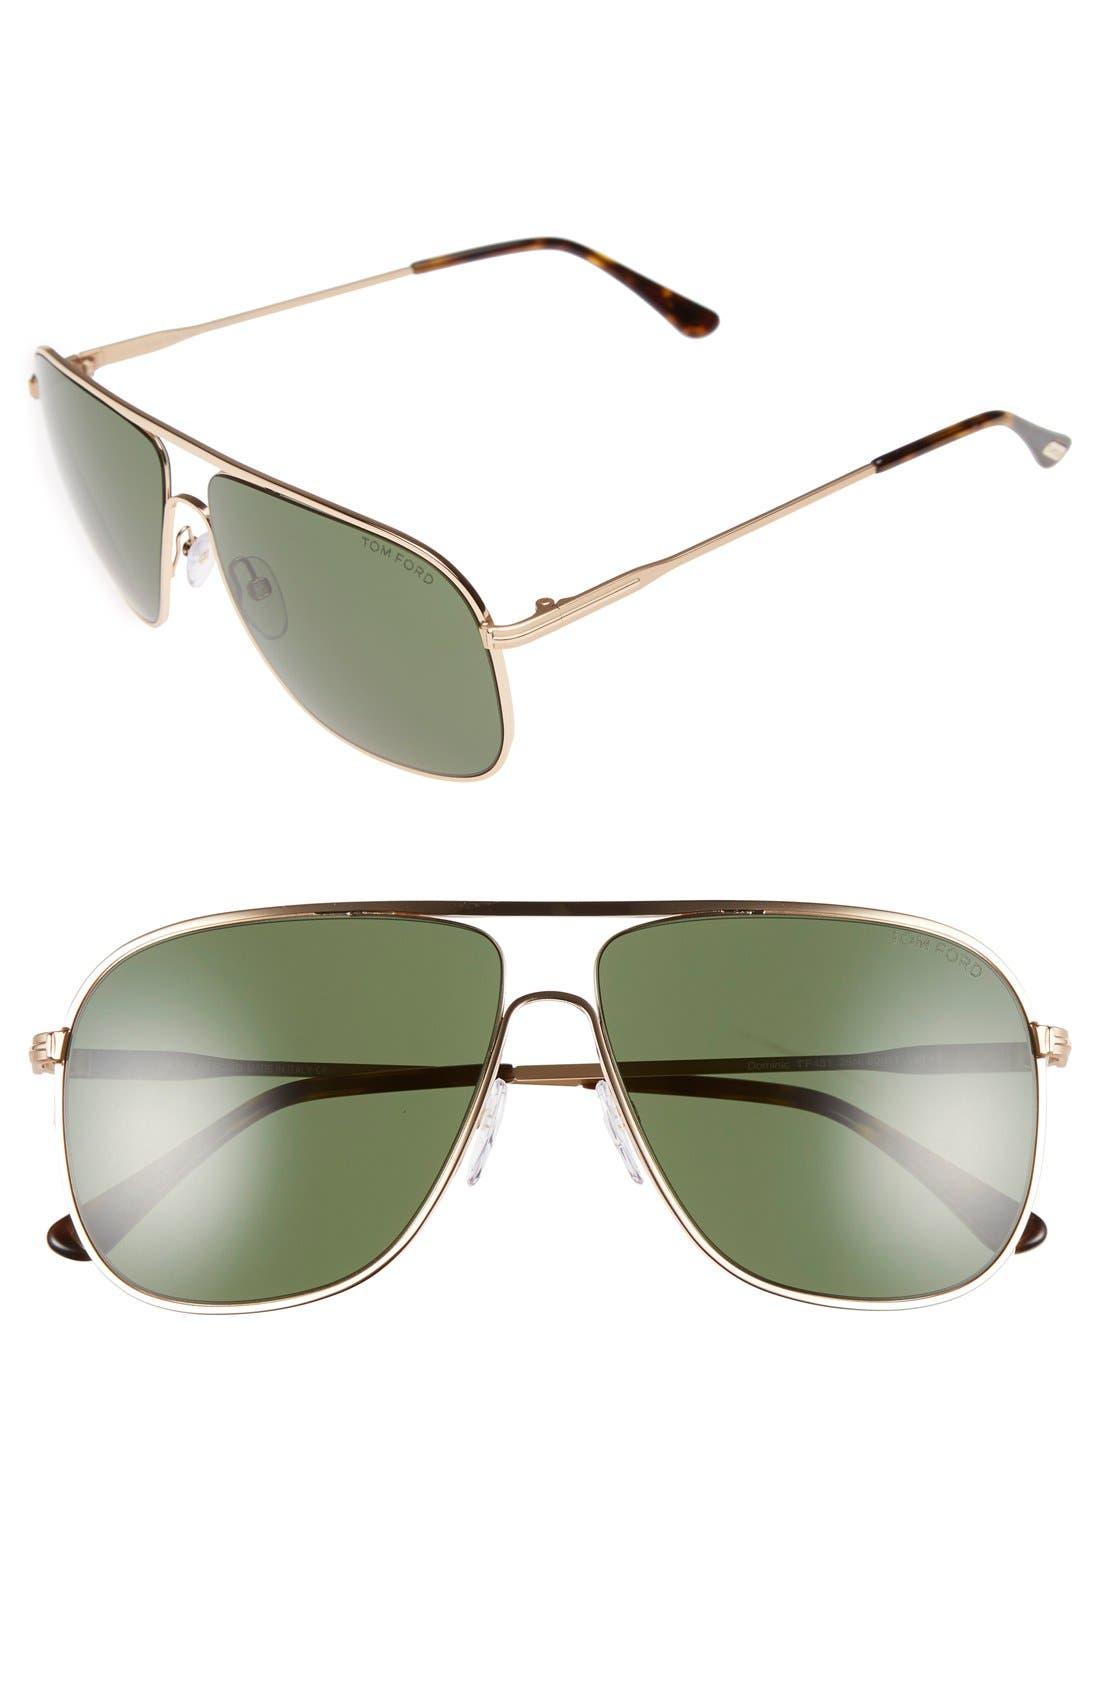 60mm Aviator Sunglasses,                         Main,                         color, SRGLD/GRN